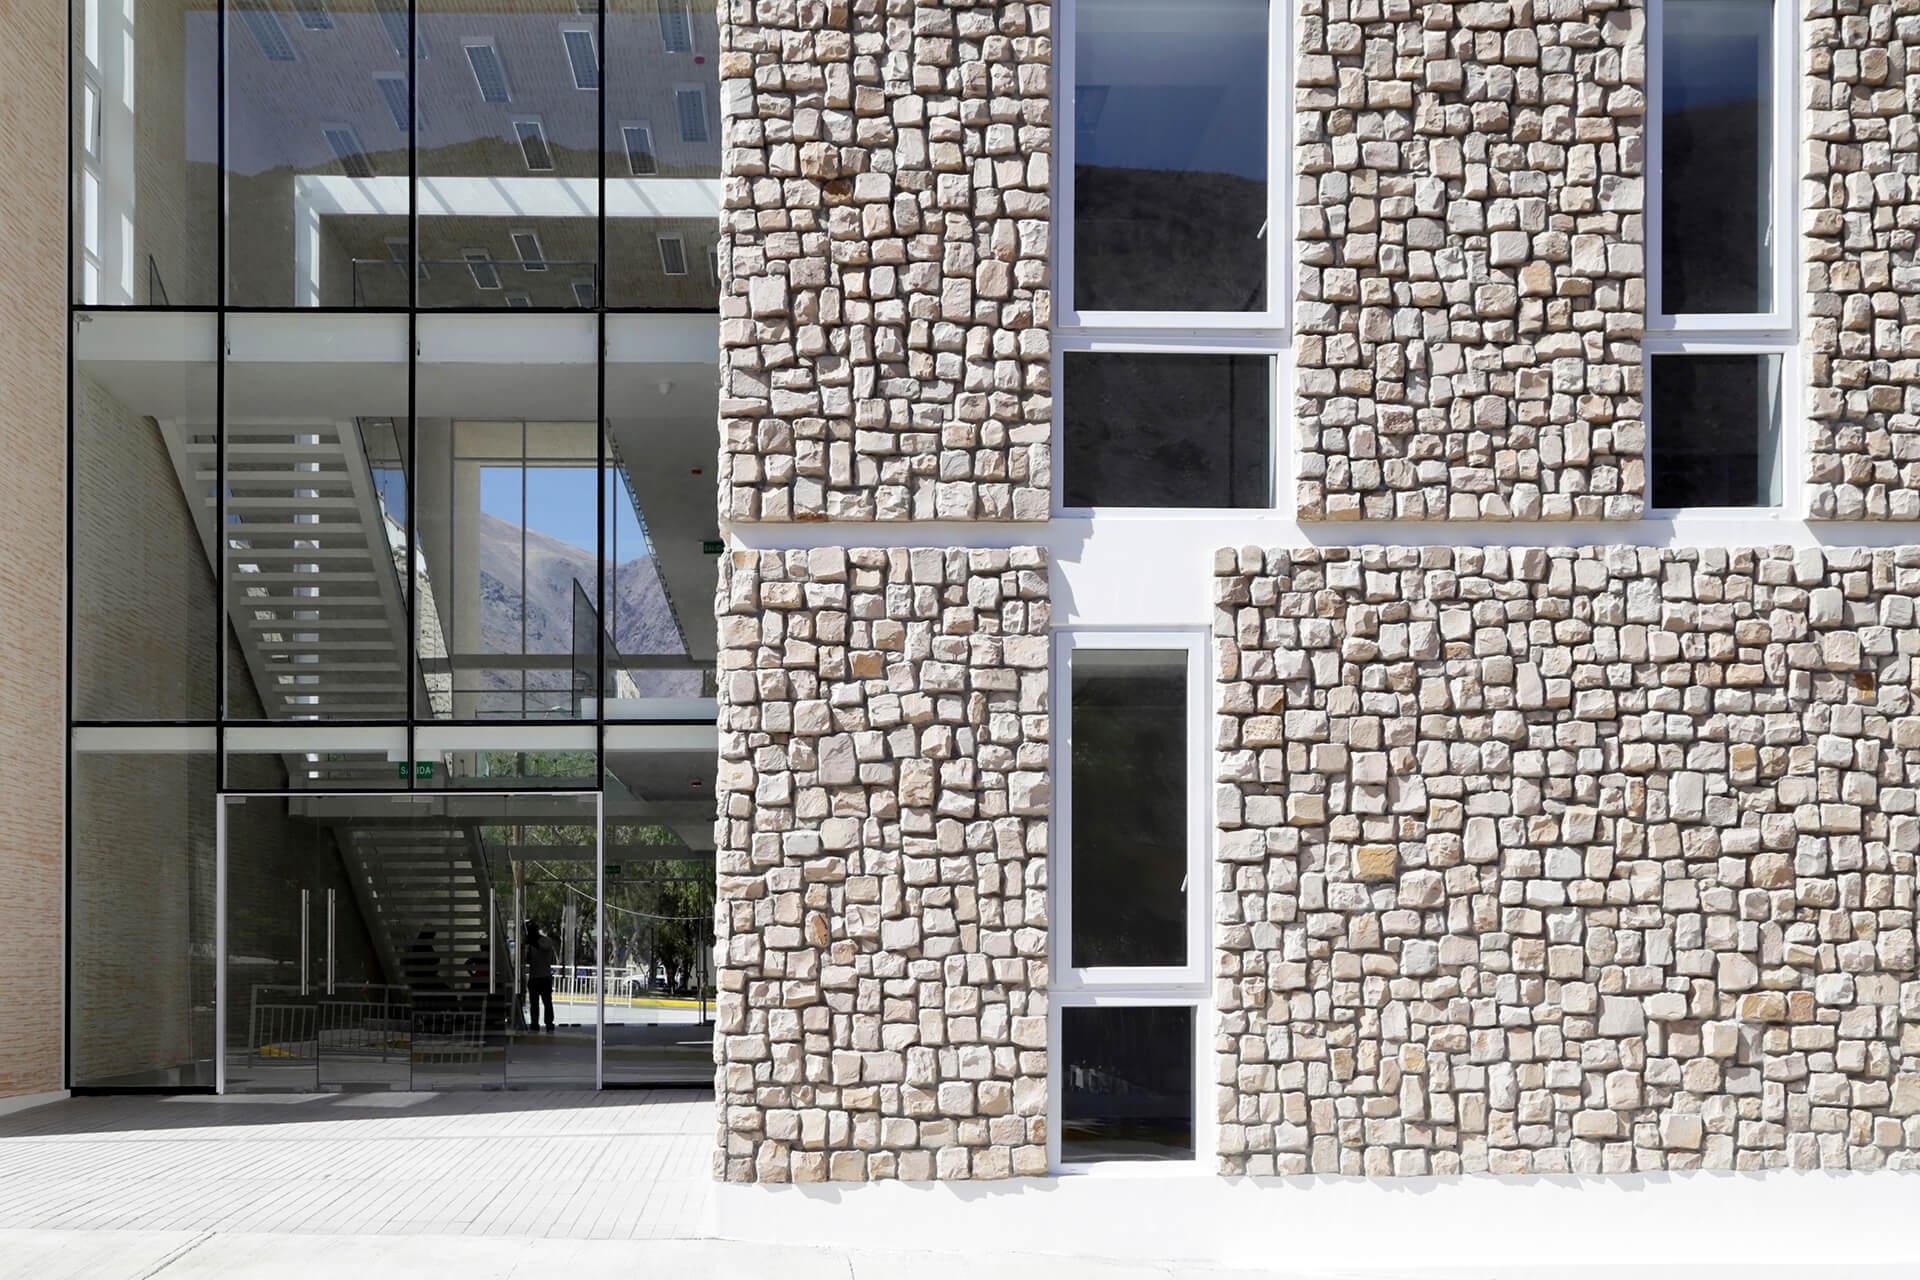 Fachada-piedra-huasco-Edificio-municipal-alto-del-carmen-constructora-rencoret-atacama